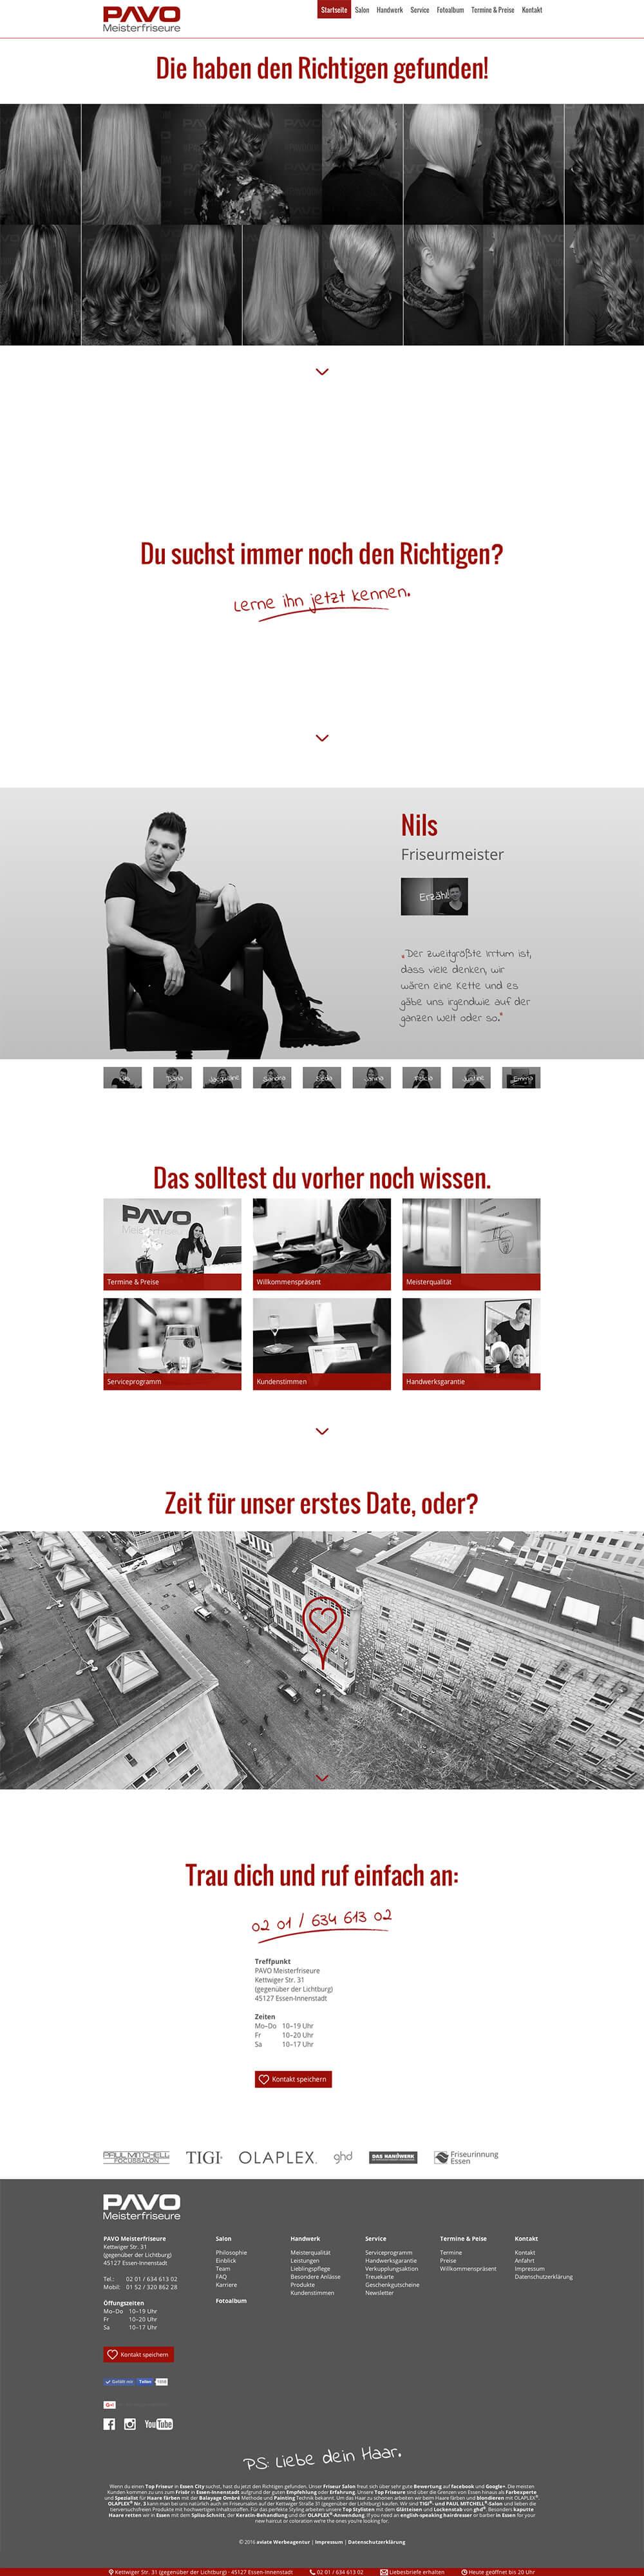 PAVO Meisterfriseure Webdesign